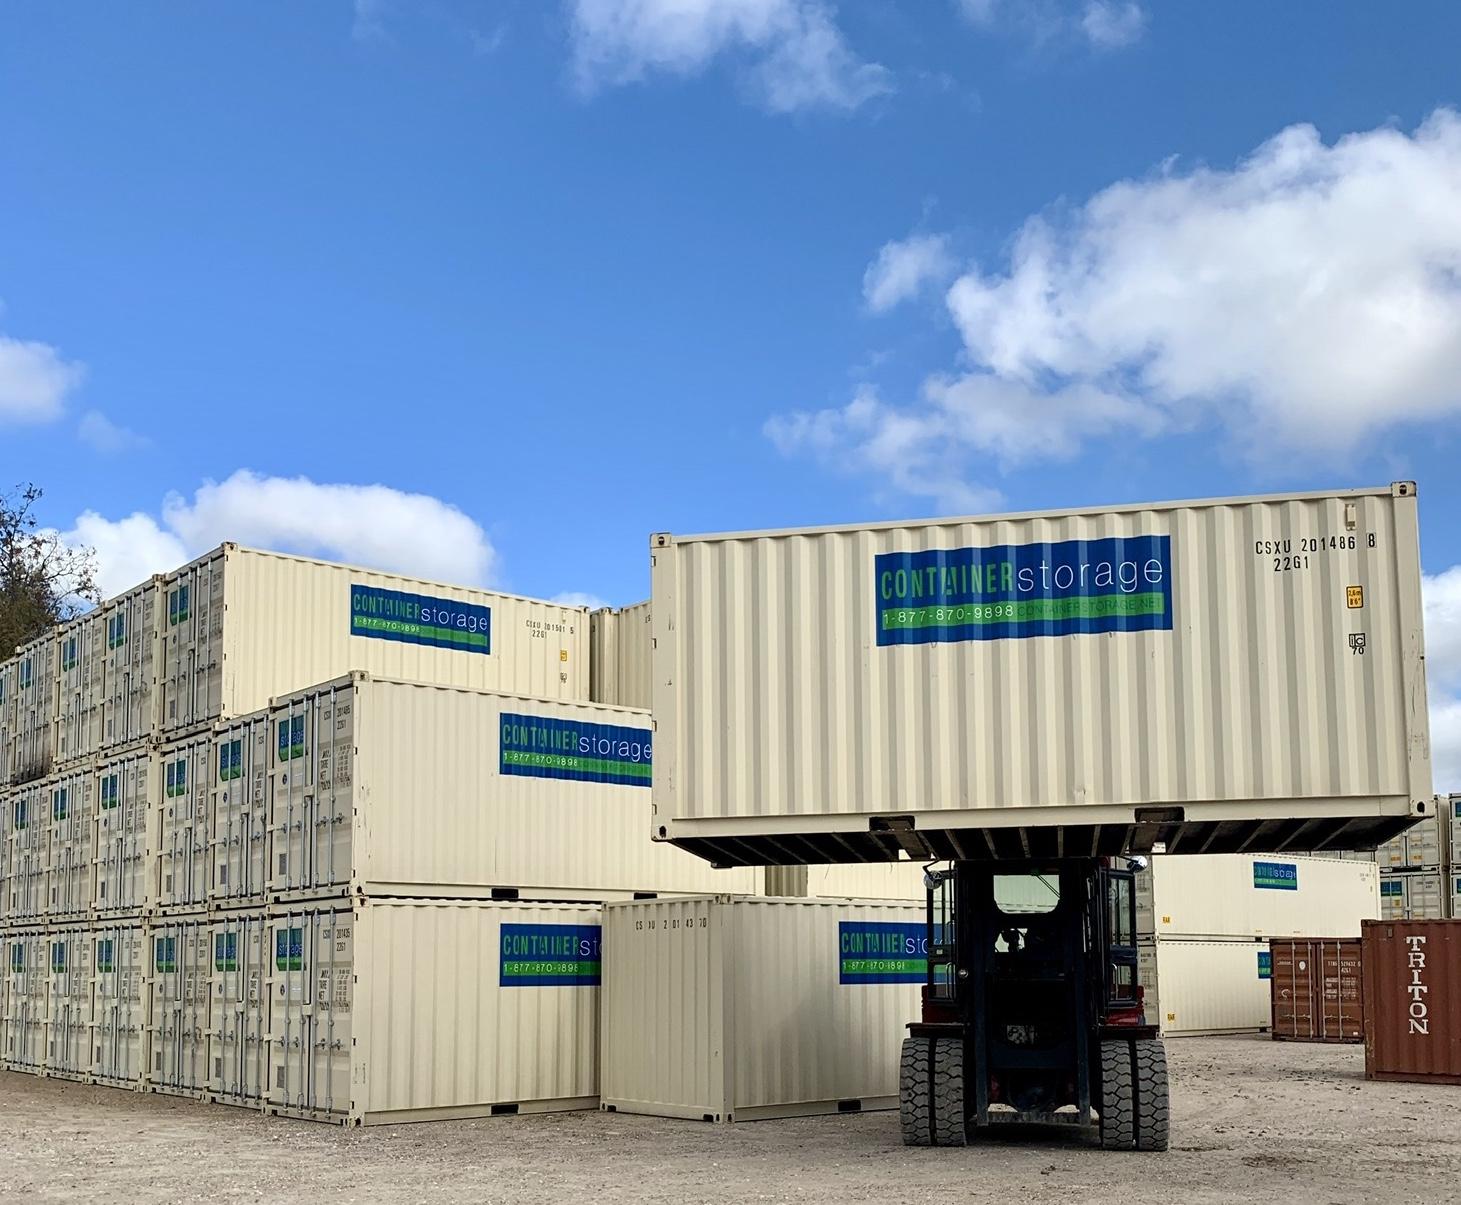 Blog — Container Storage